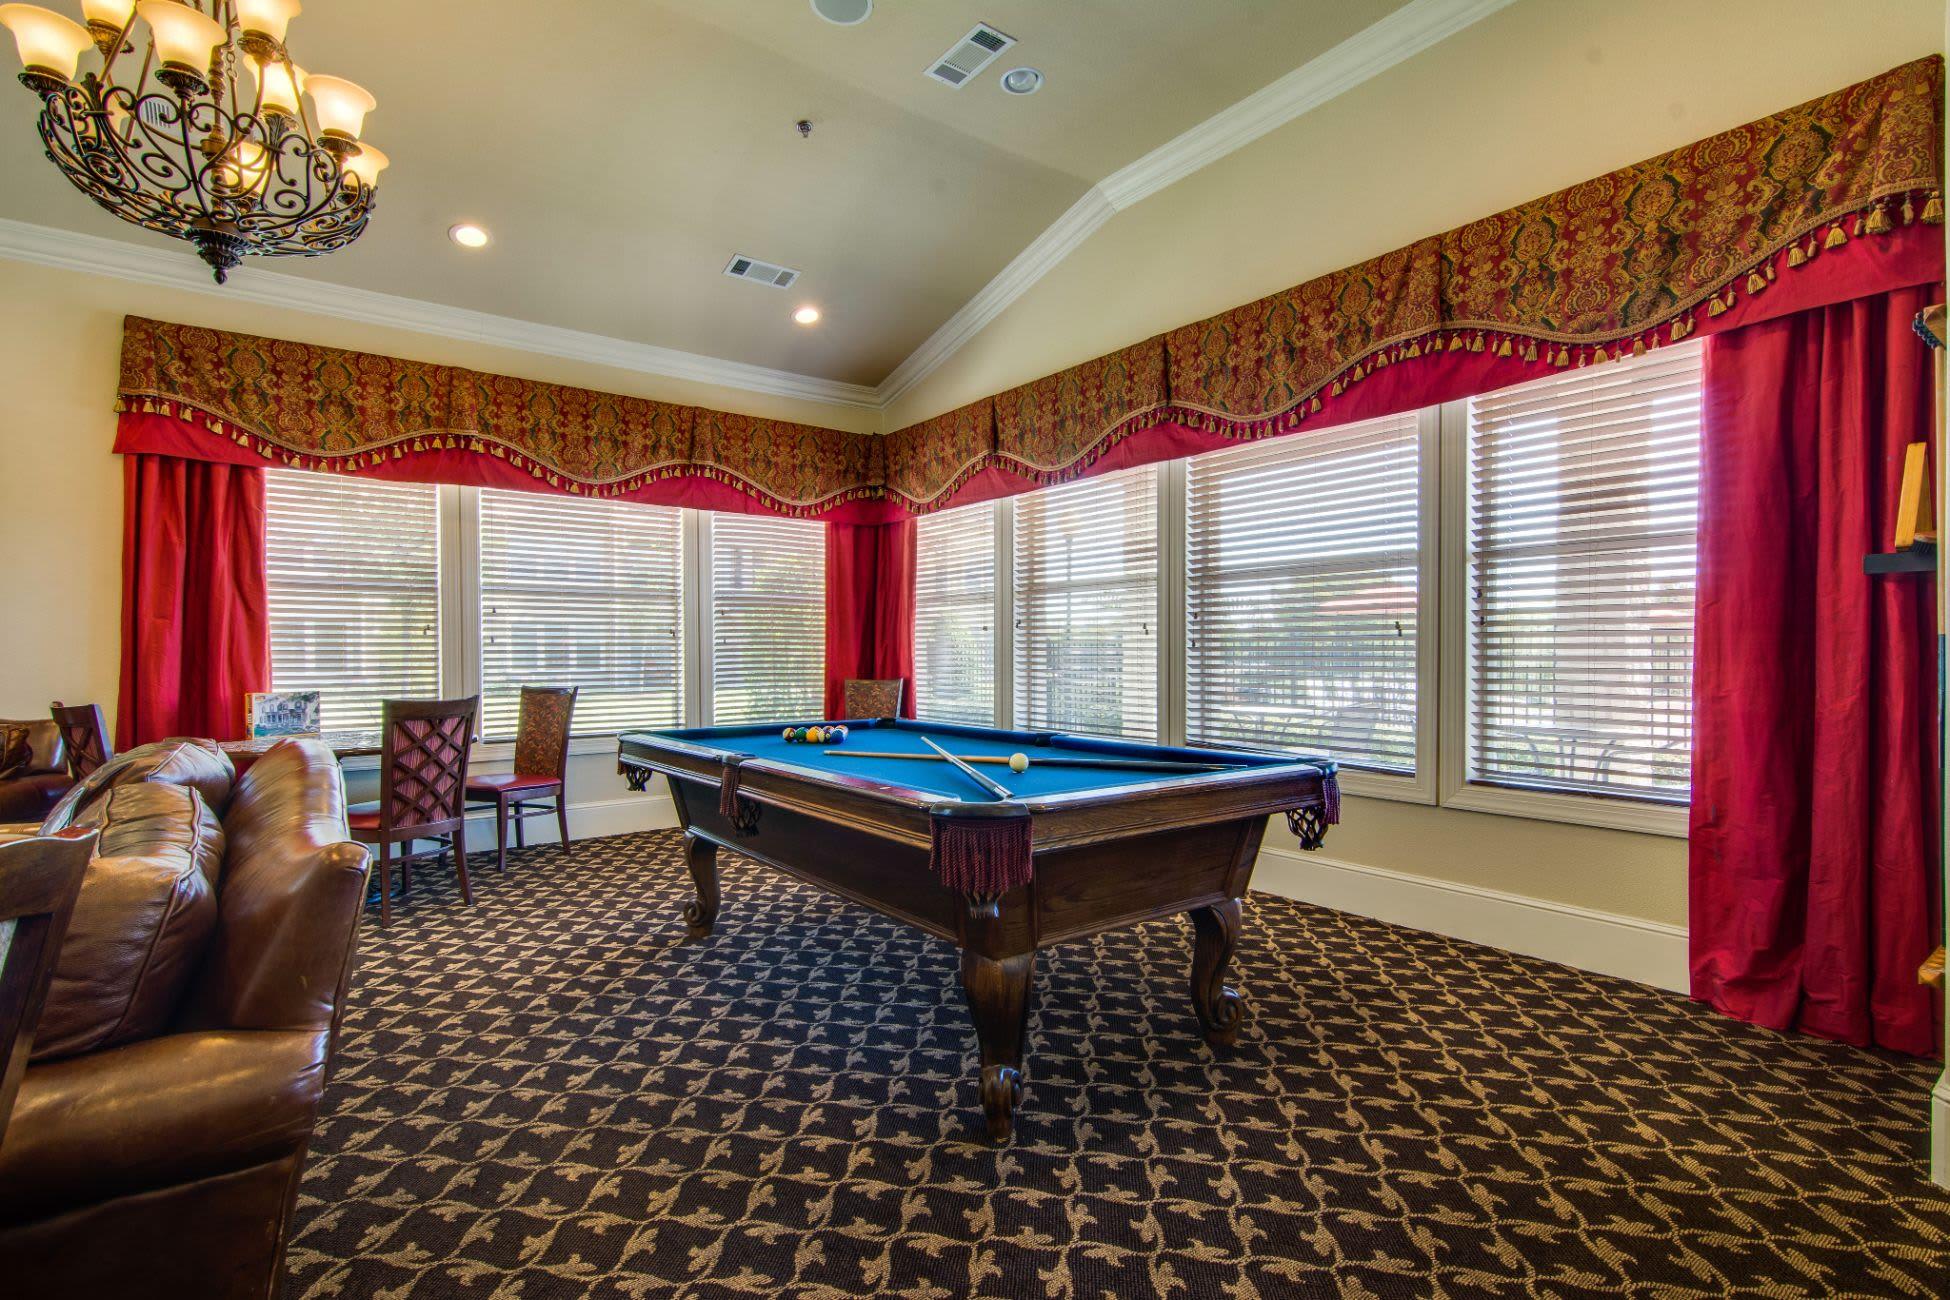 Billiards table at Marquis Rockwall in Rockwall, Texas